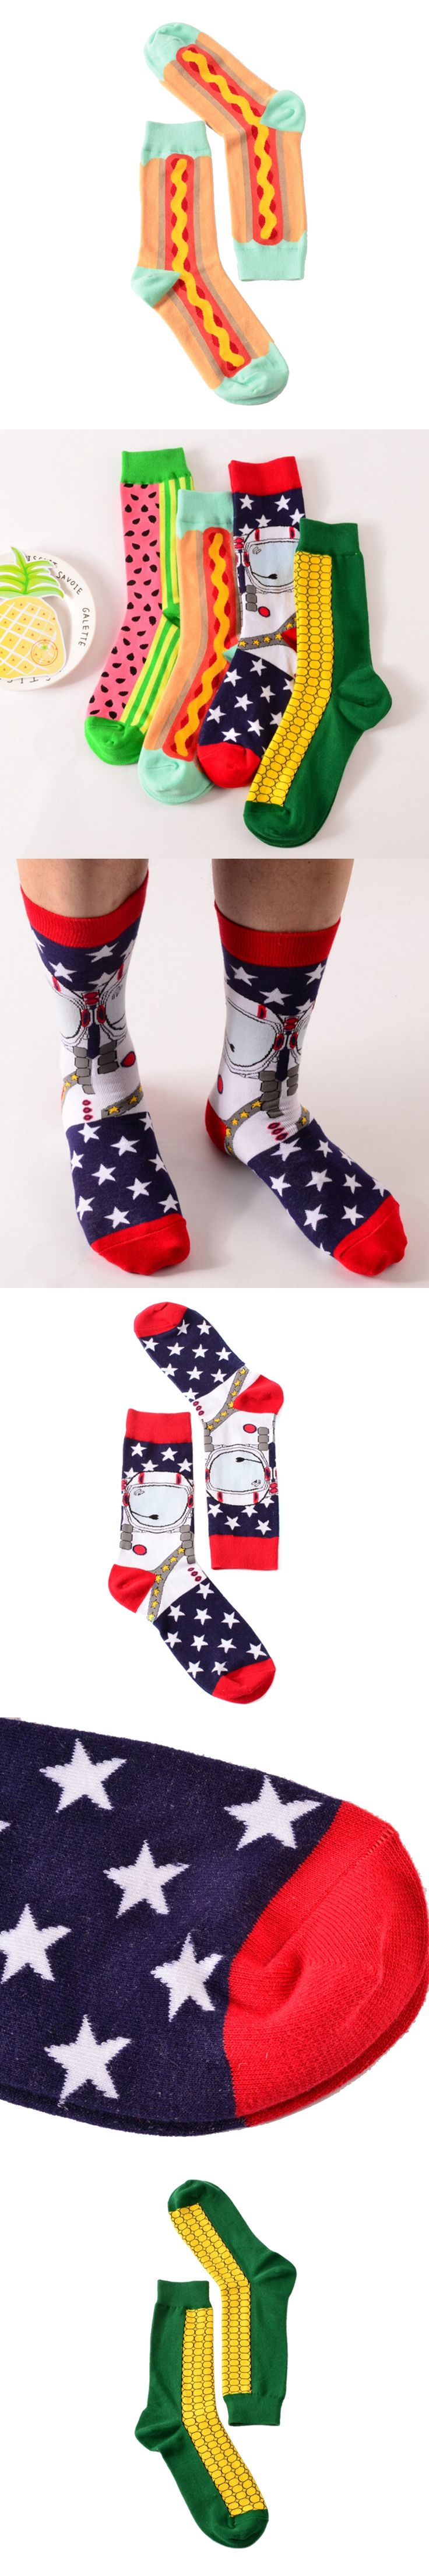 1 pair new brand men cotton casual socks in tube novelty harajuku designer fashion street watermelon skateboard long funny socks